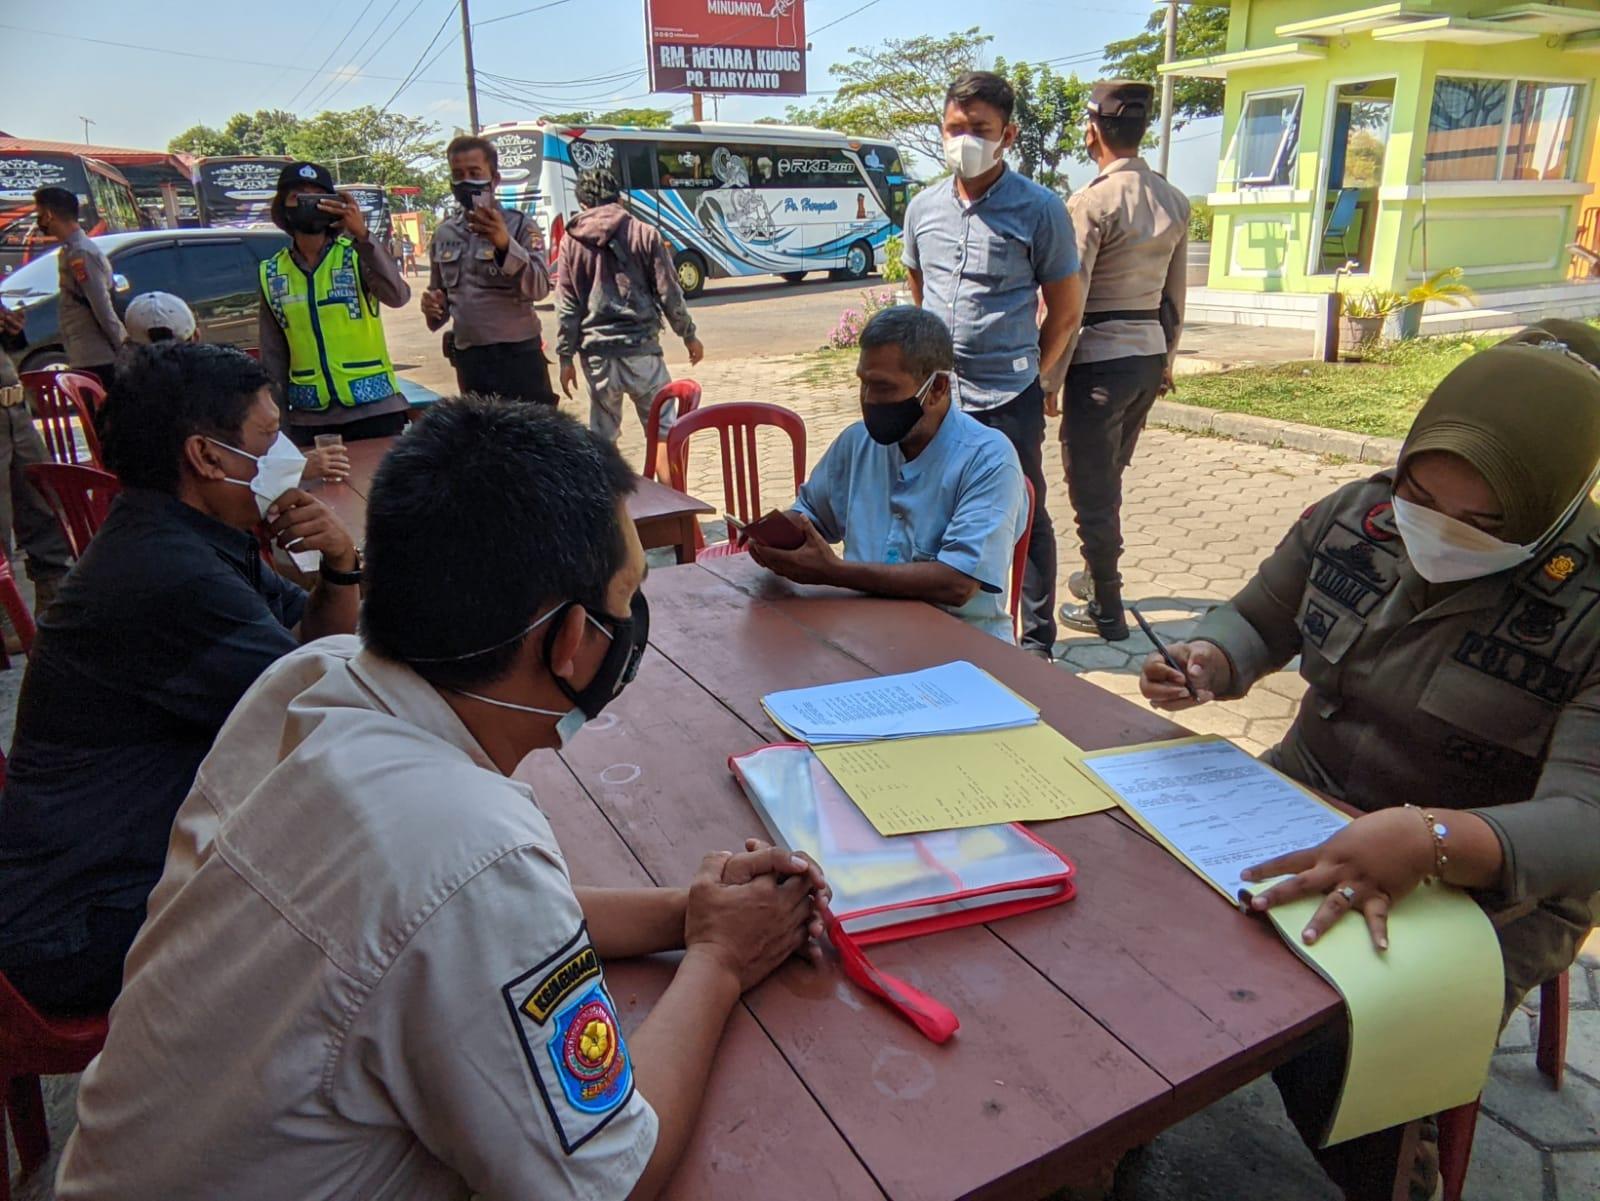 Patroli PPKM Darurat, Petugas Gabungan Datangi Sektor Industri dan Bagikan Bansos